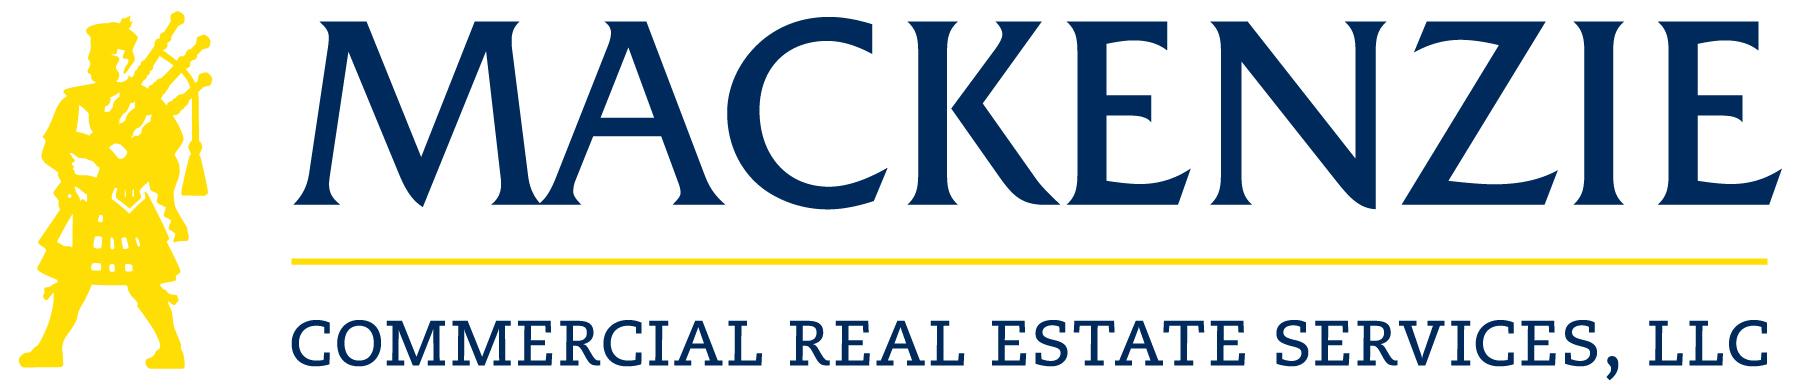 mackenzie_logos_commercial